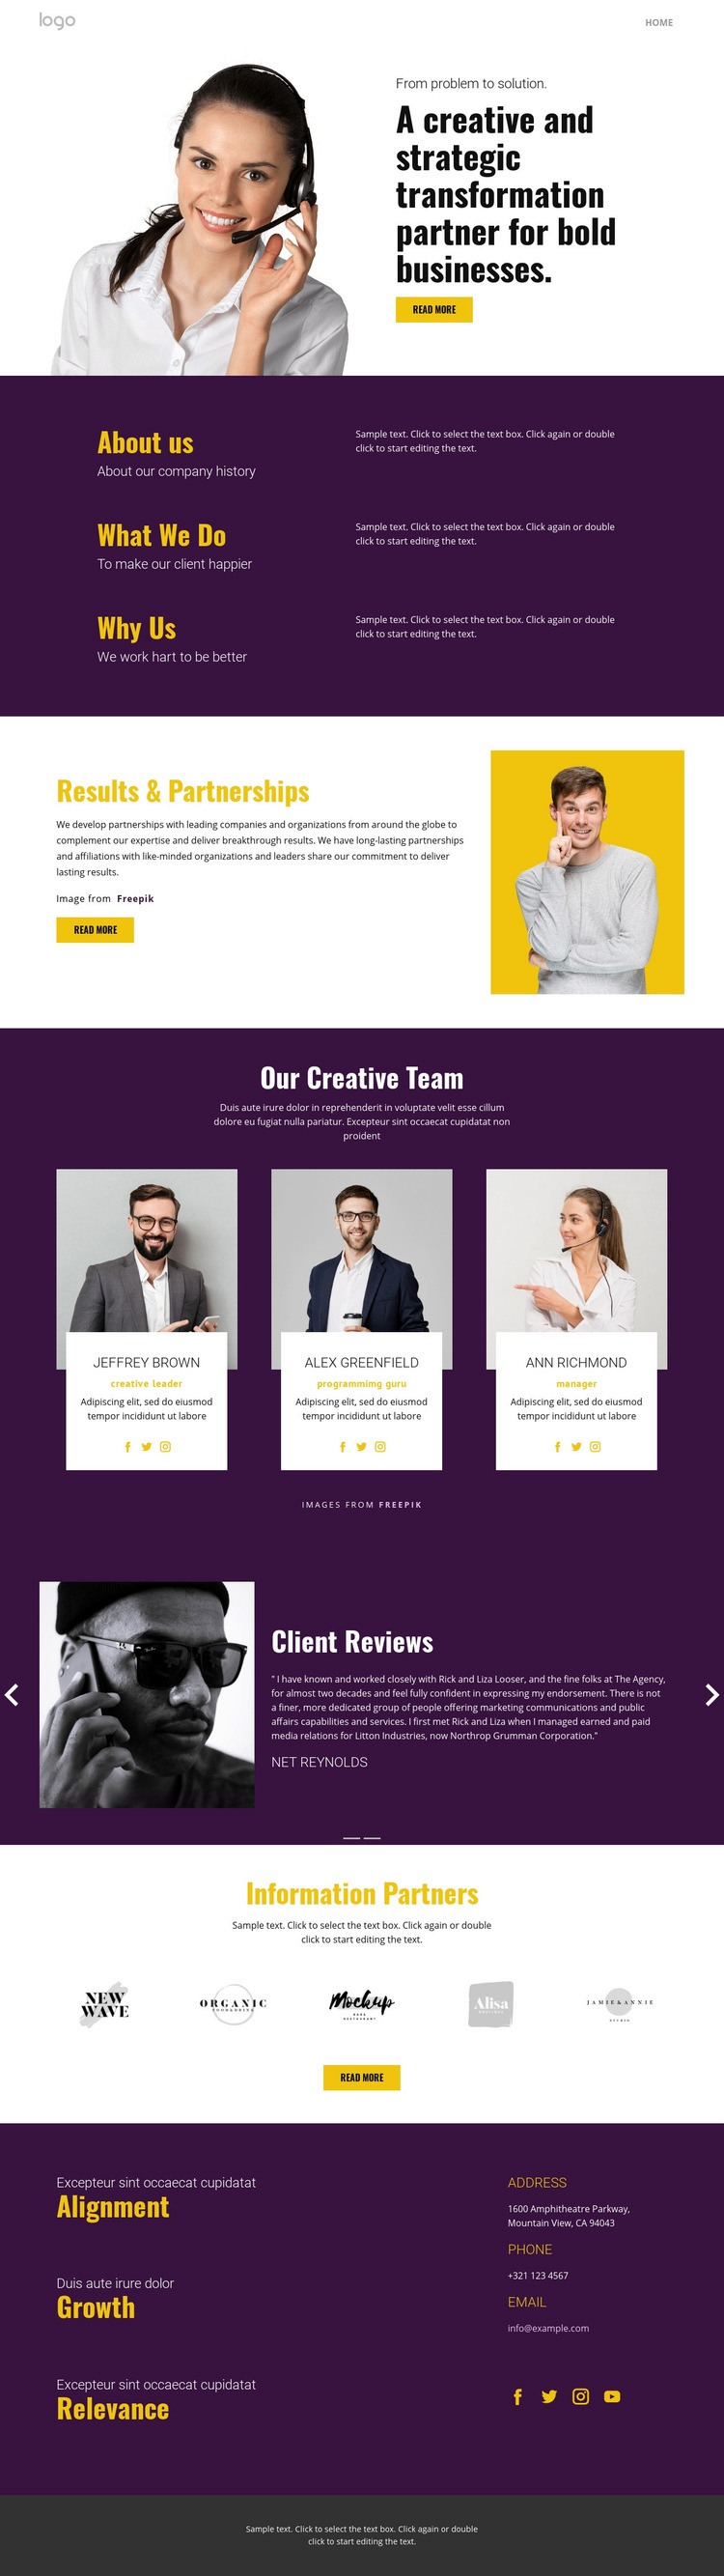 Creative strategy in business Wysiwyg Editor Html